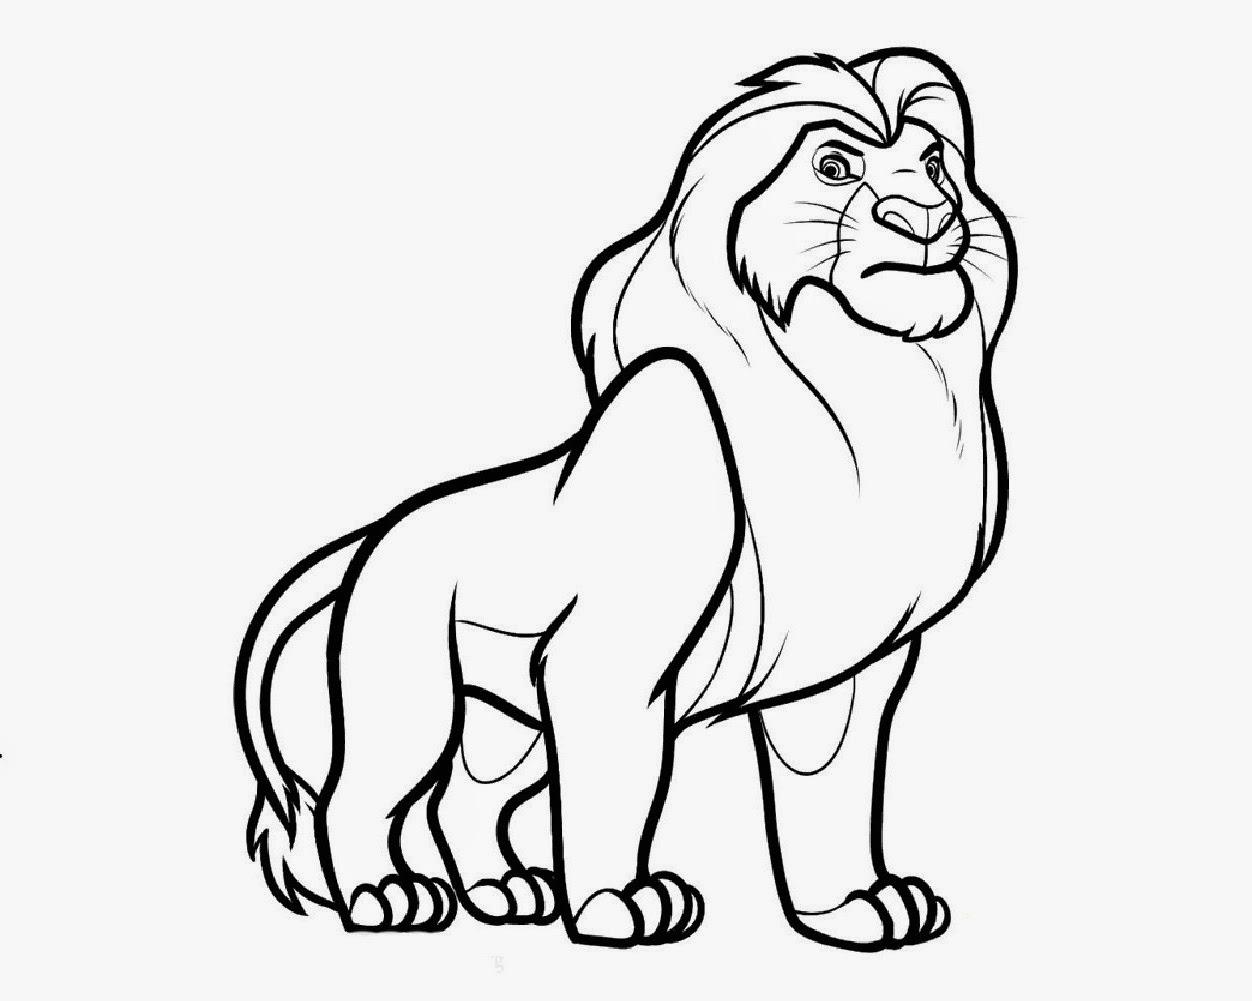 1252x1001 Easy Pencil Sketches Of Cartoon Lion